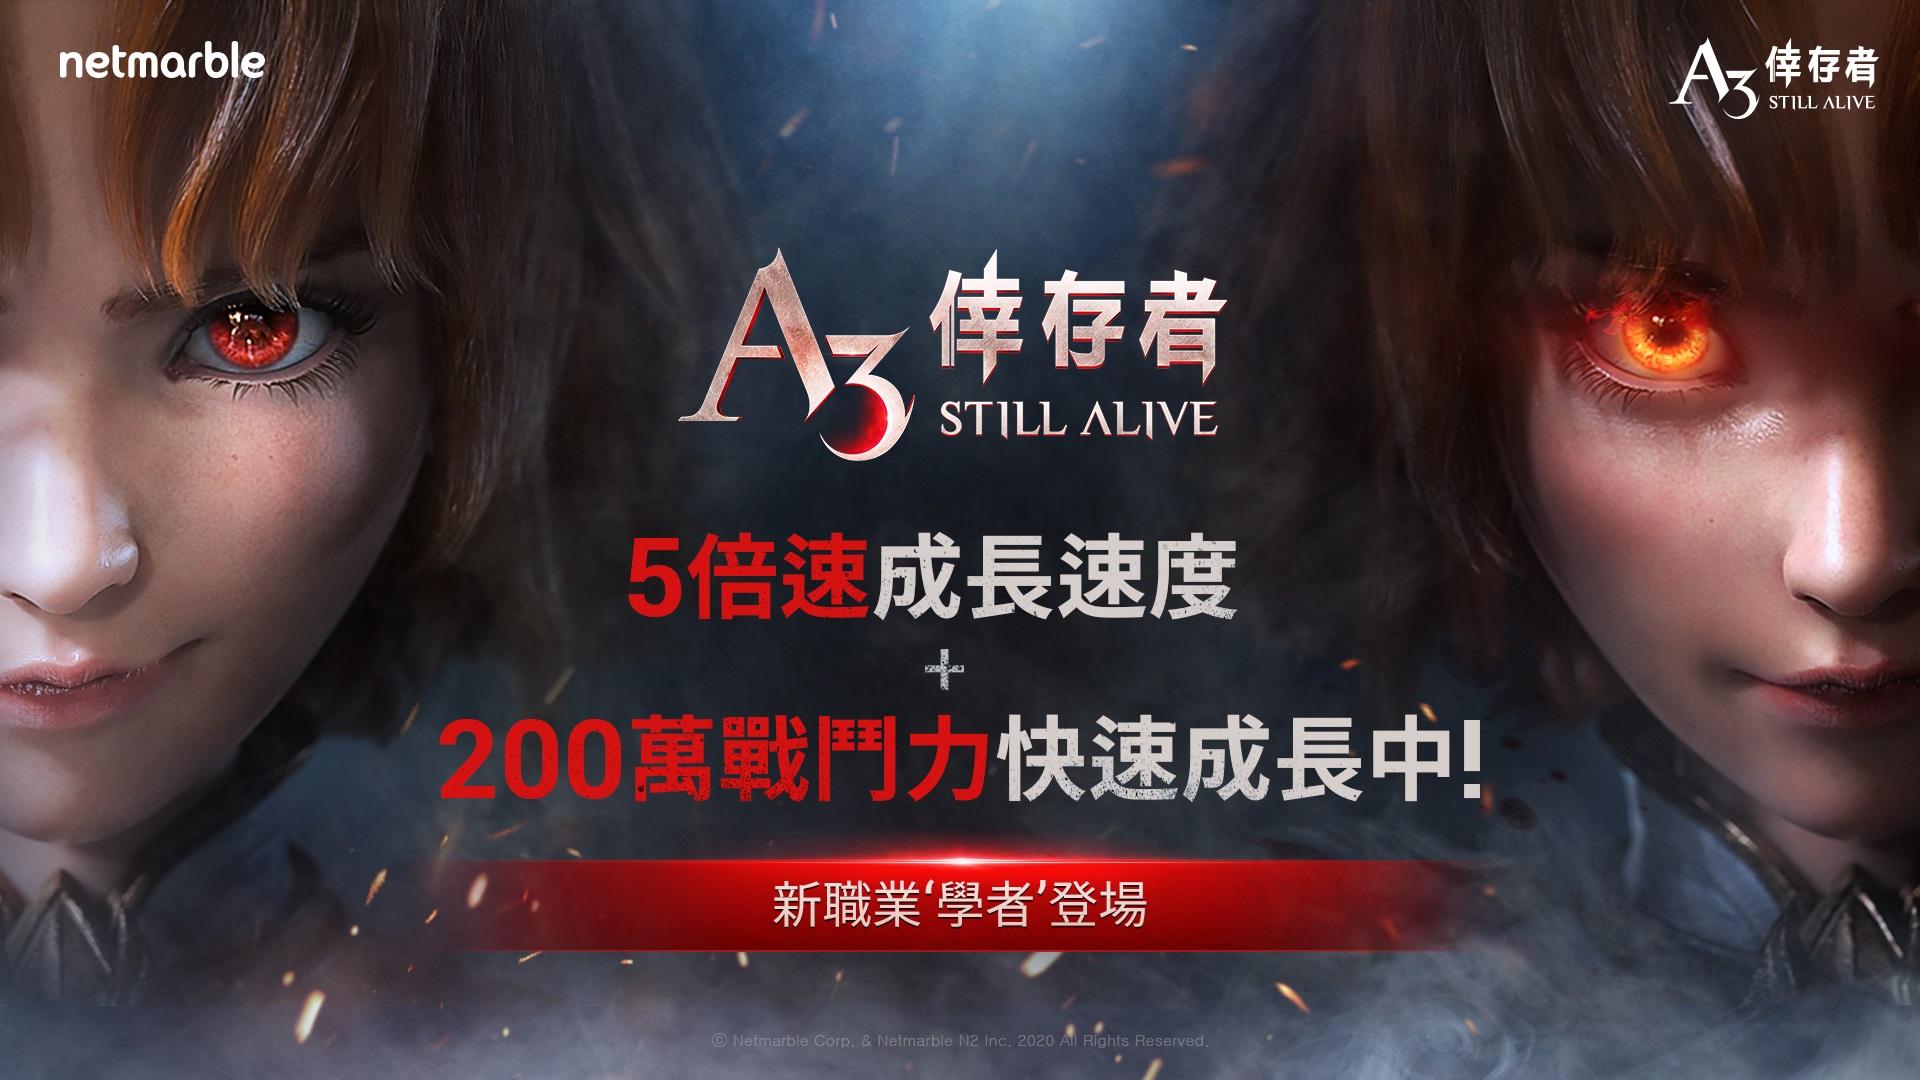 《A3: STILL ALIVE 倖存者》更新  全新職業「學者」和經驗值5倍成長活動登場